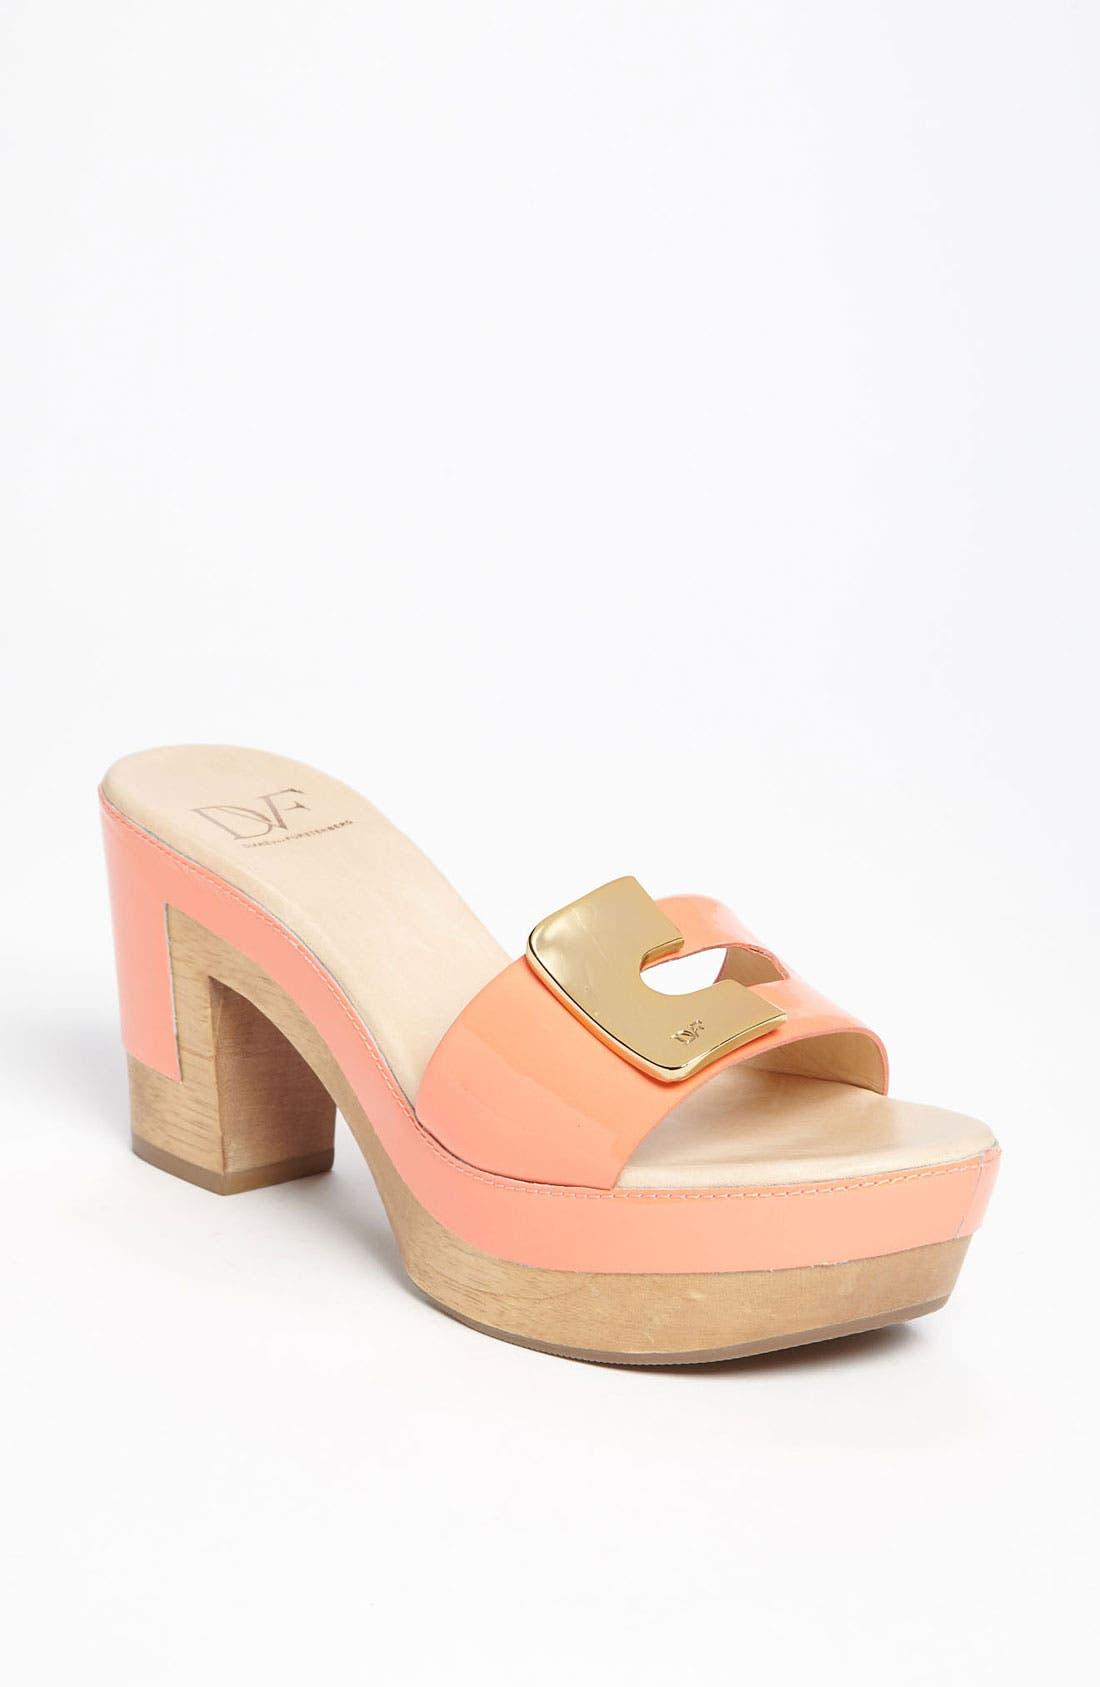 Alternate Image 1 Selected - Diane von Furstenberg 'Straton' Sandal